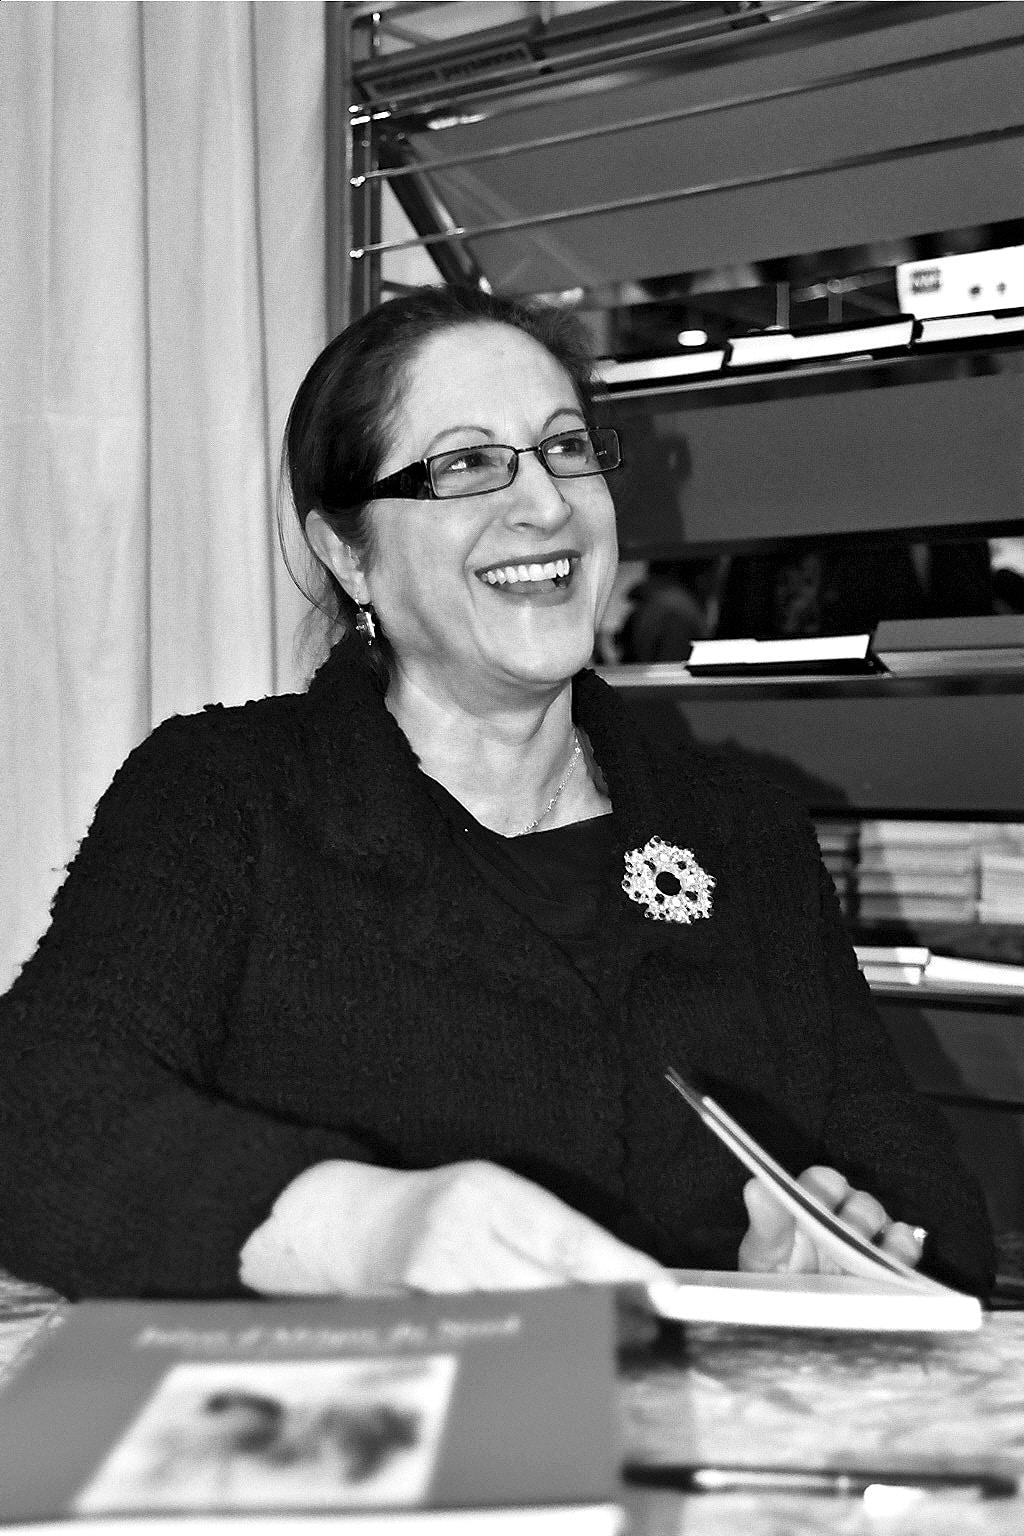 Nicole S. Serfaty